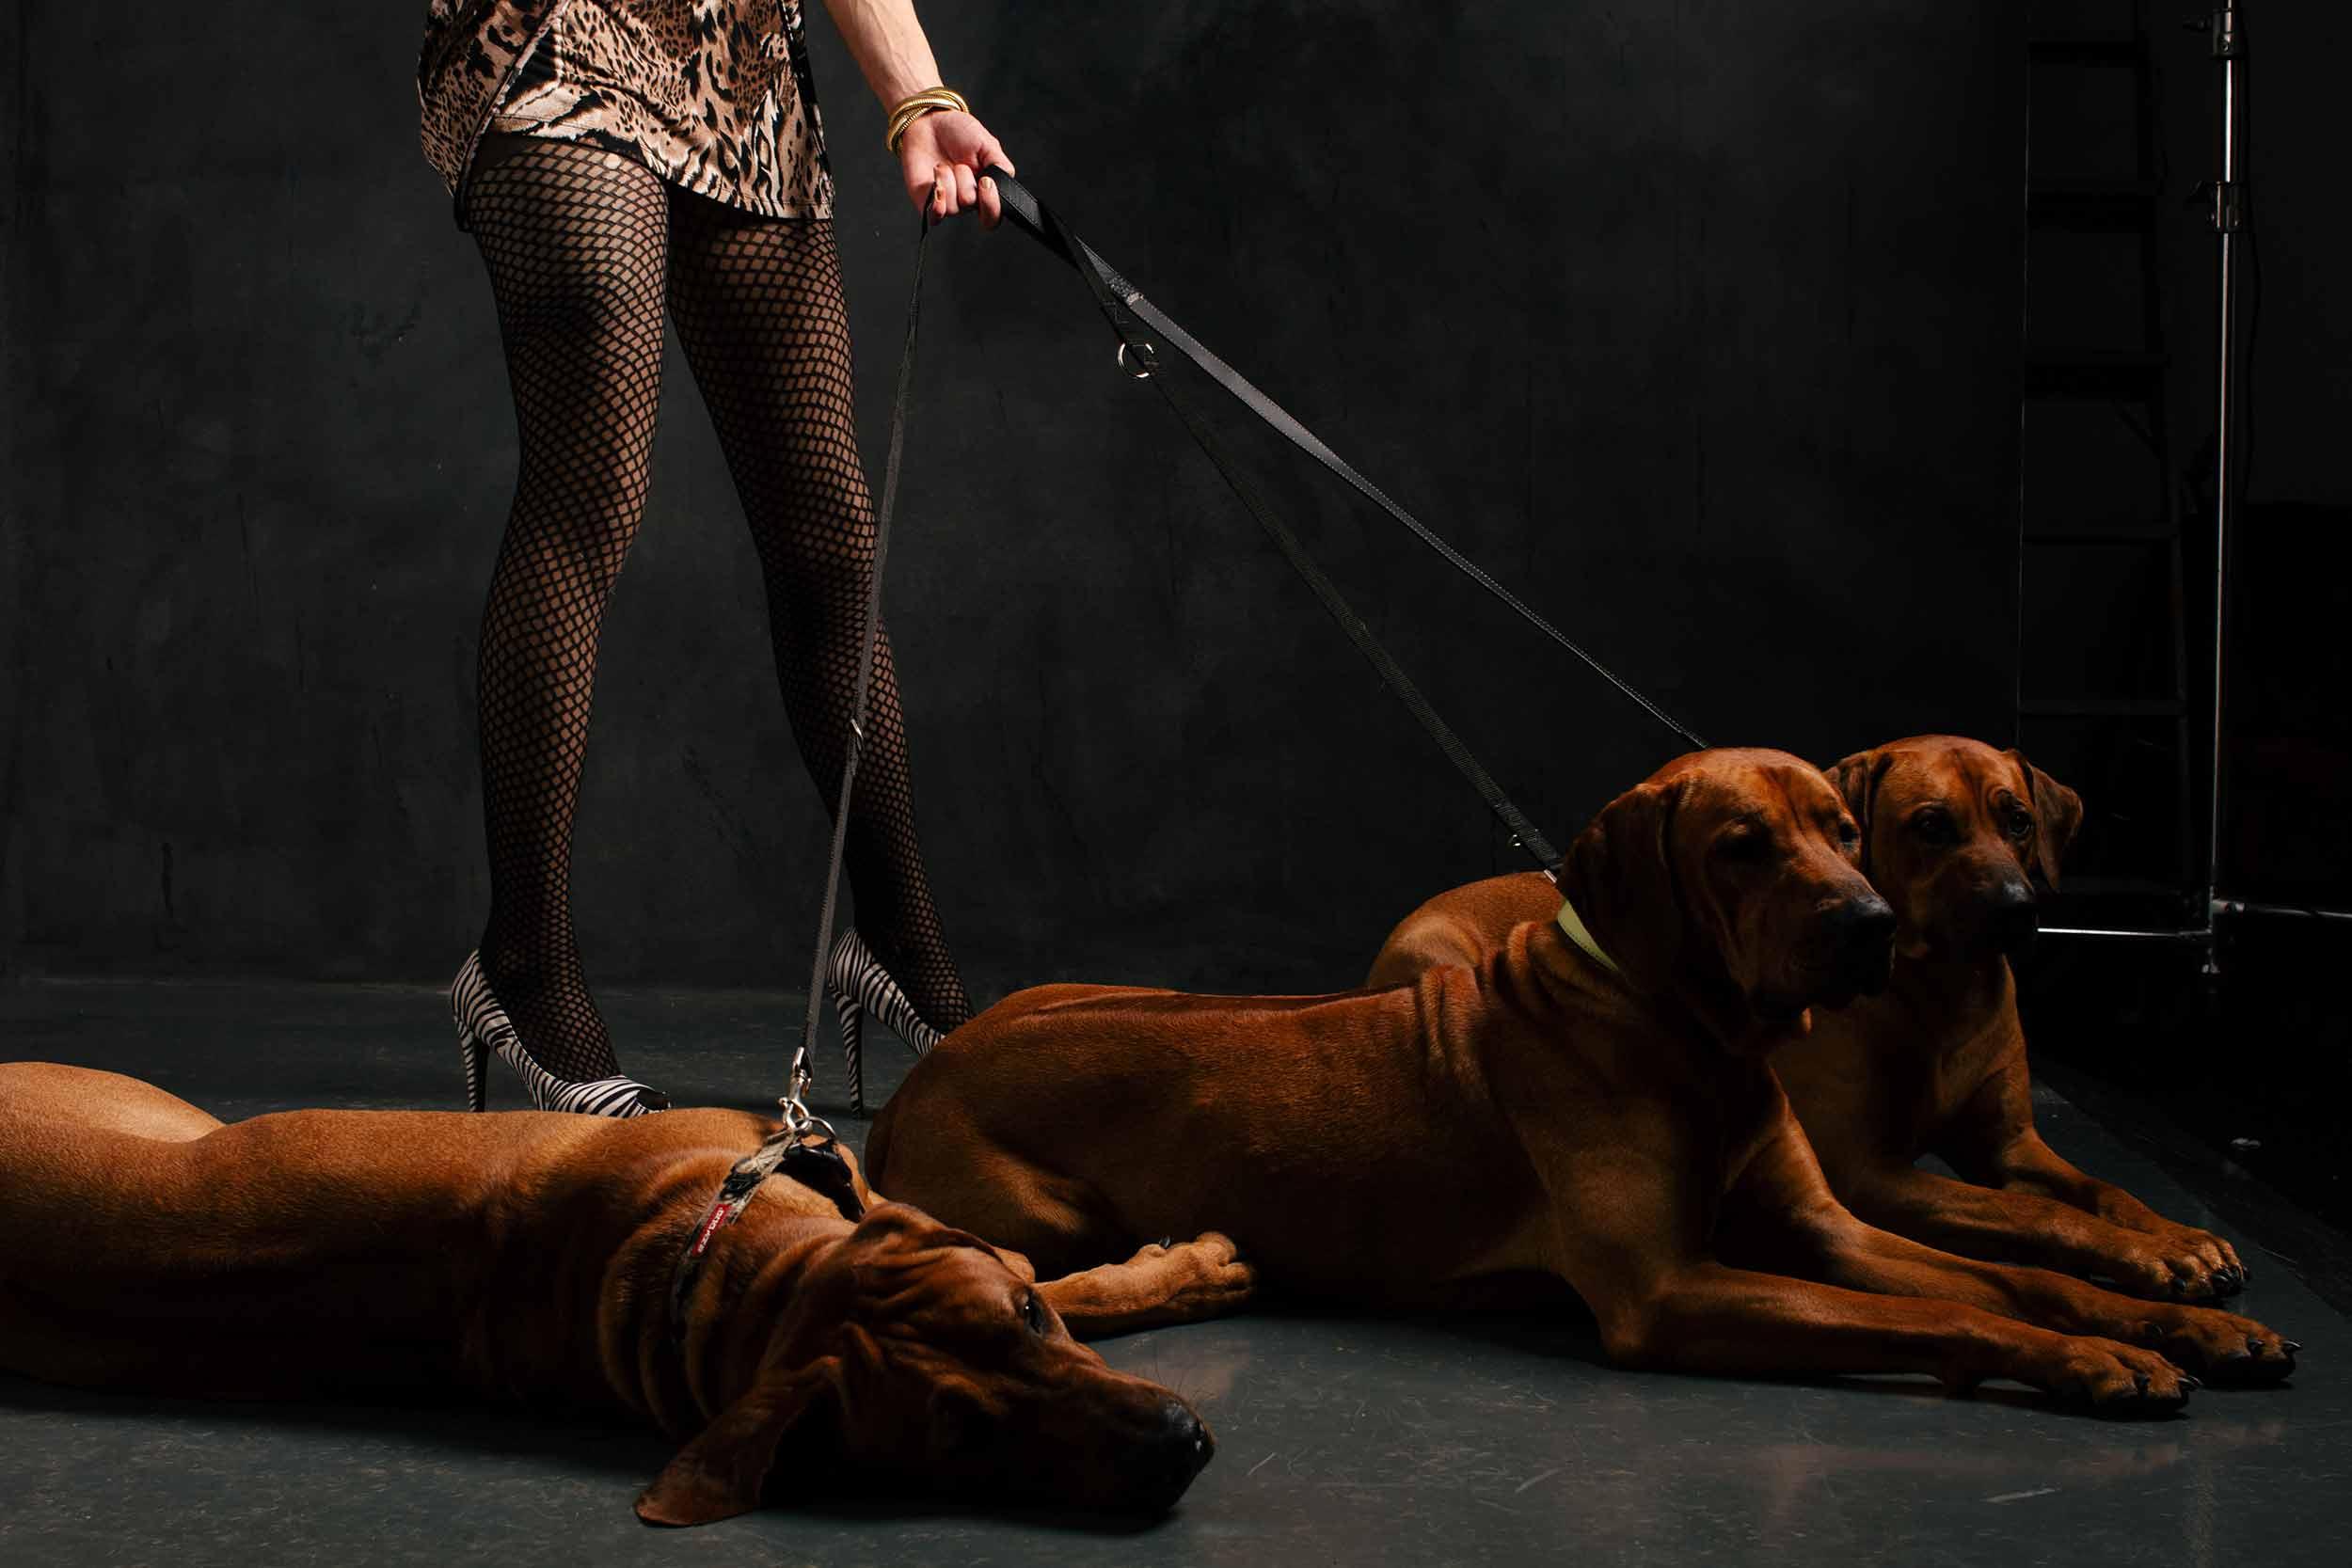 12.01---Dogs-Life_0005_1168.jpg